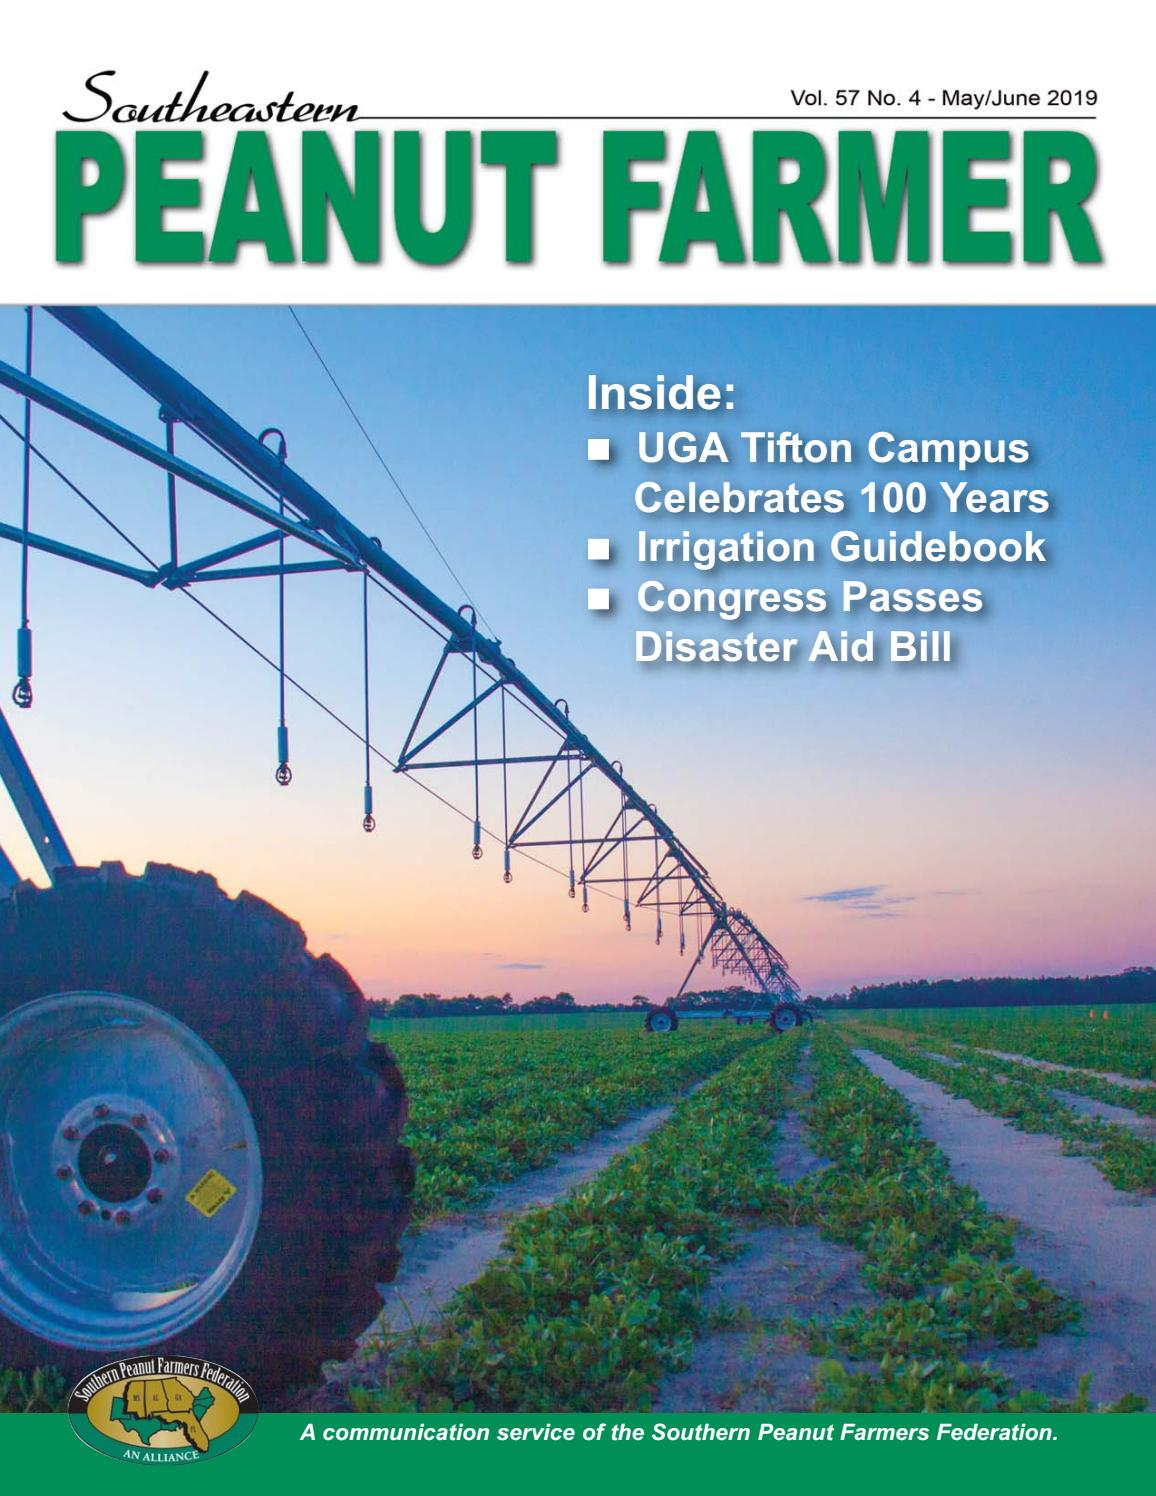 carte pass pass perdue May/June 2019   Southeastern Peanut Farmer by SEPF   issuu